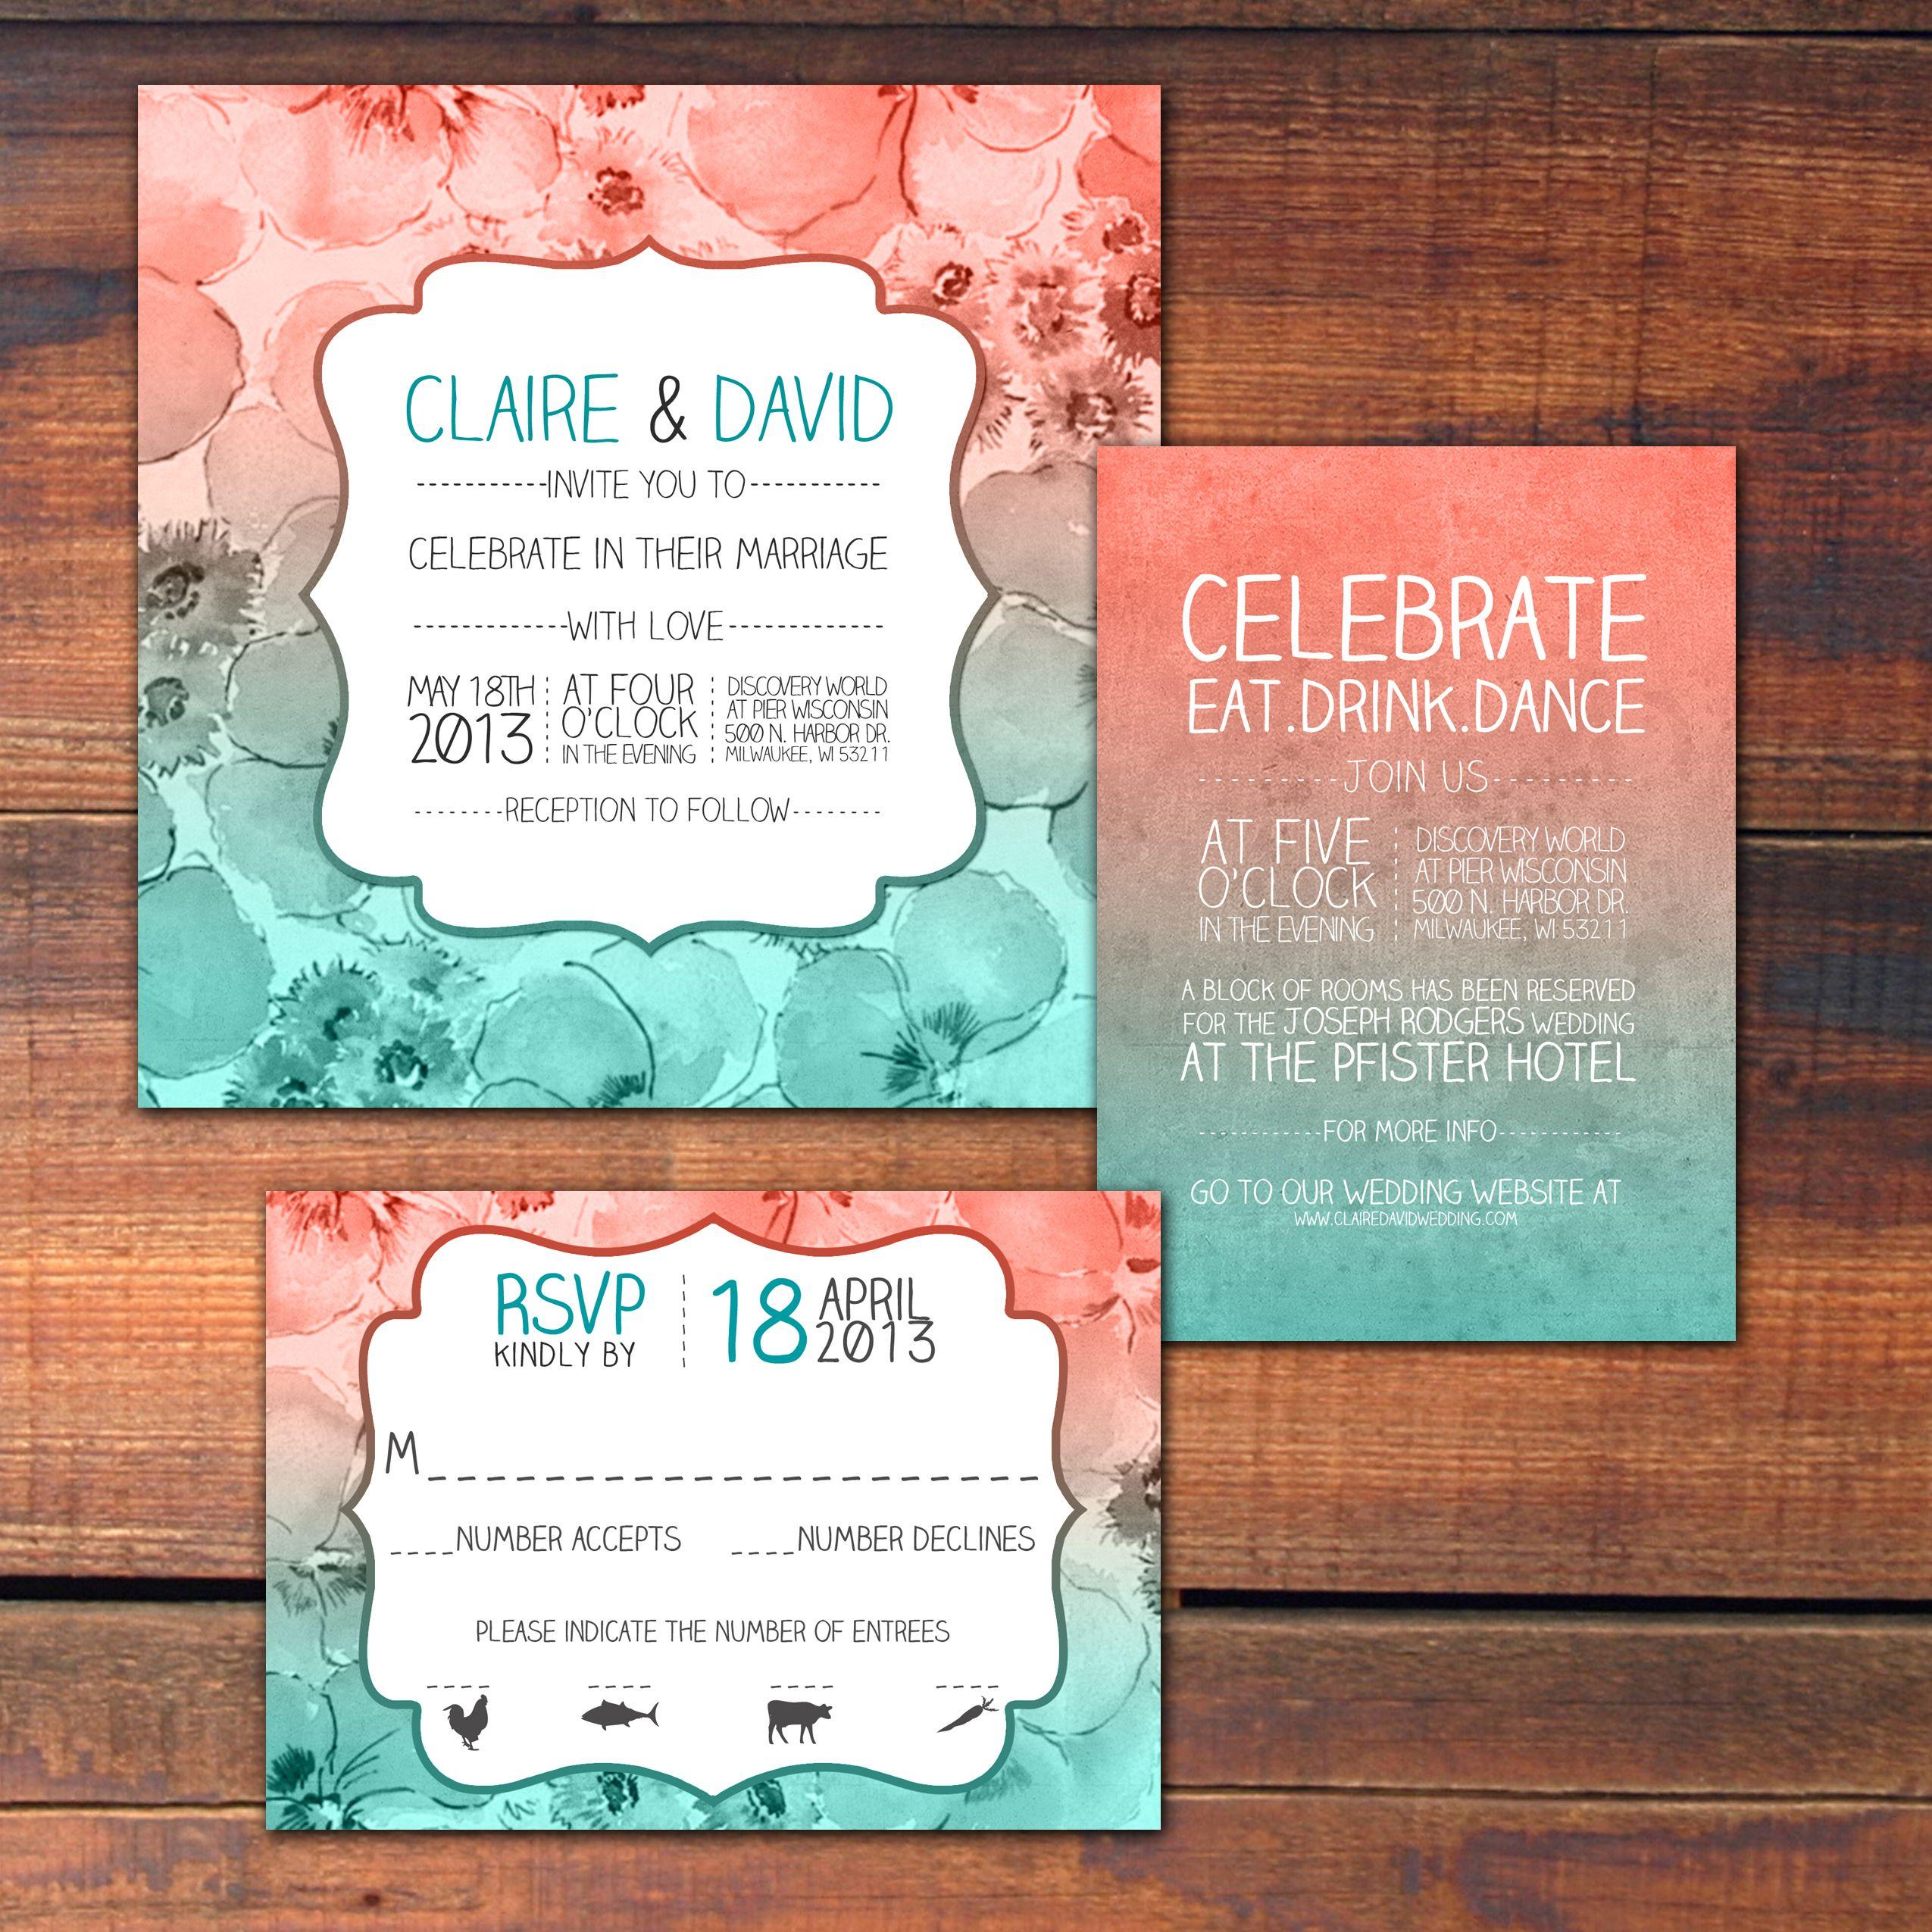 Teal Inspired Wedding Invitations